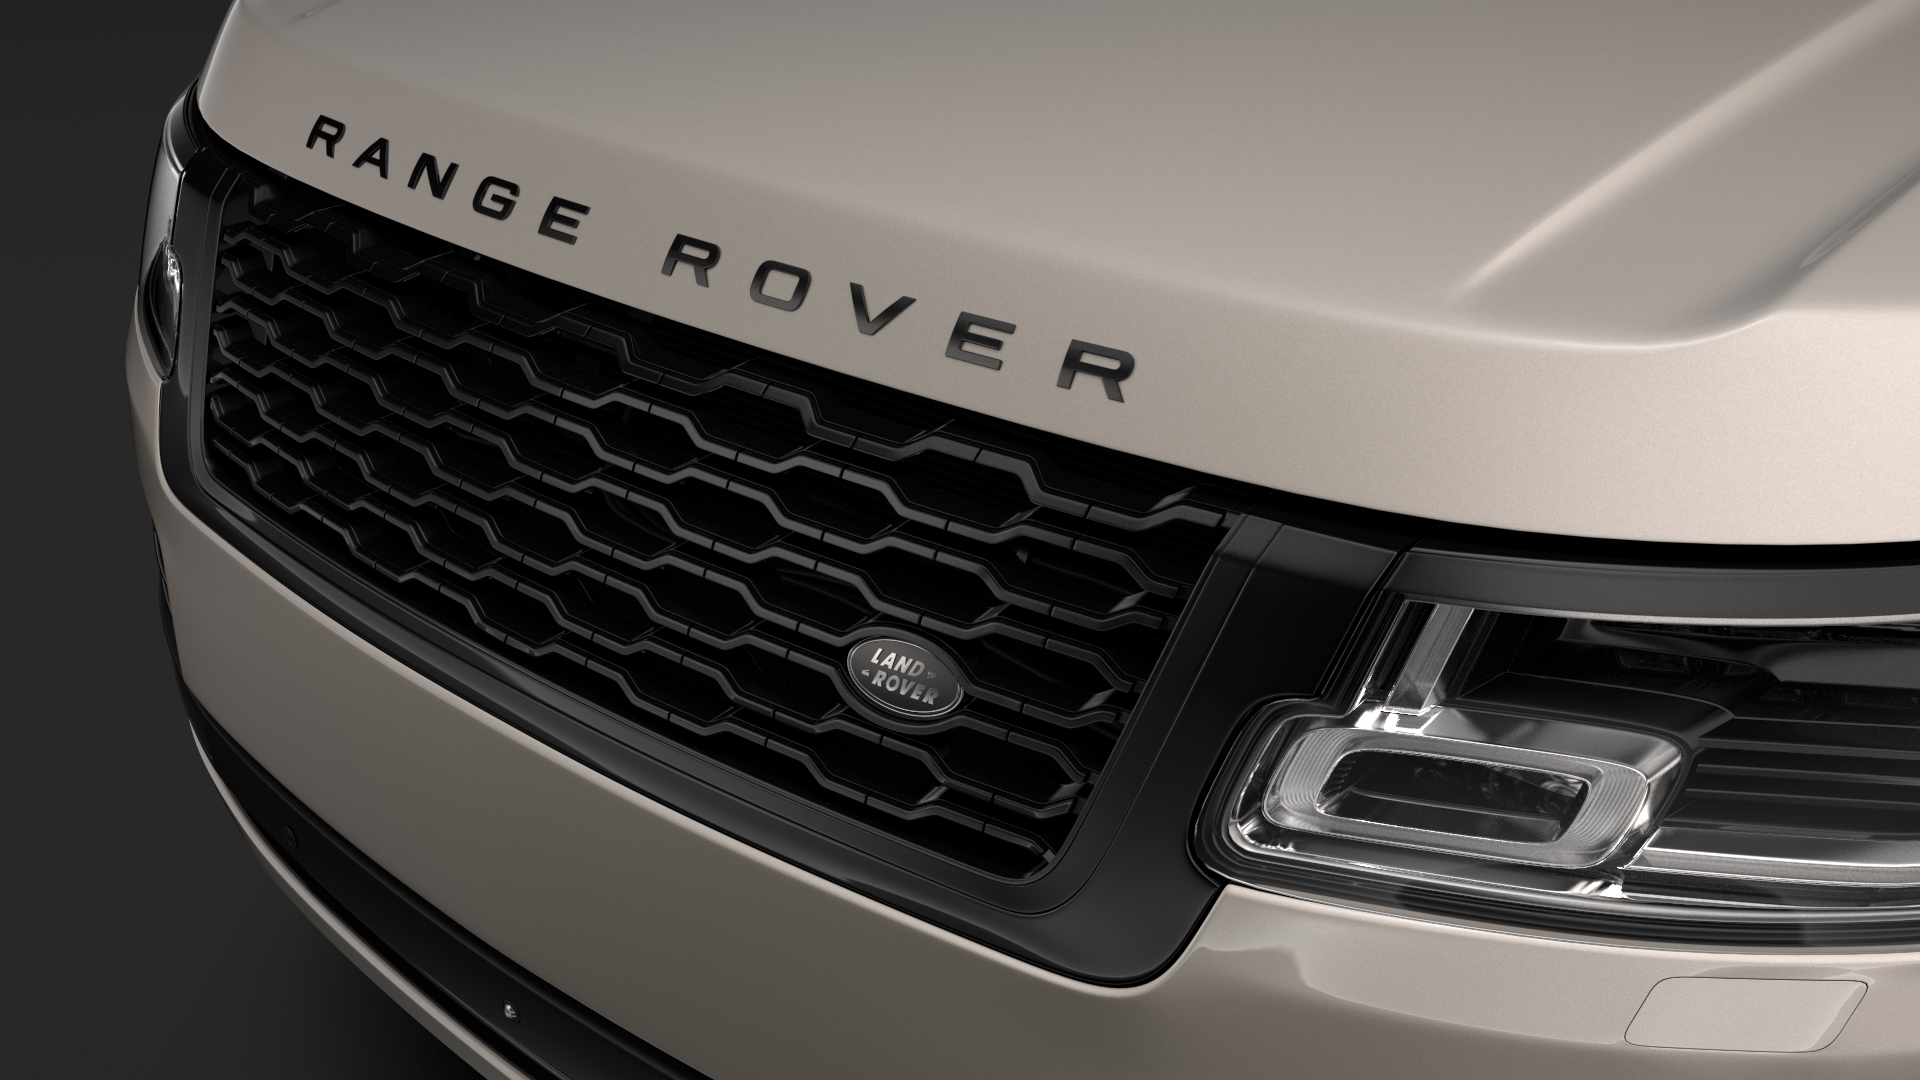 range rover autobiography hybrid (l405) 2018 3d model max fbx c4d lwo ma mb hrc xsi obj 278145